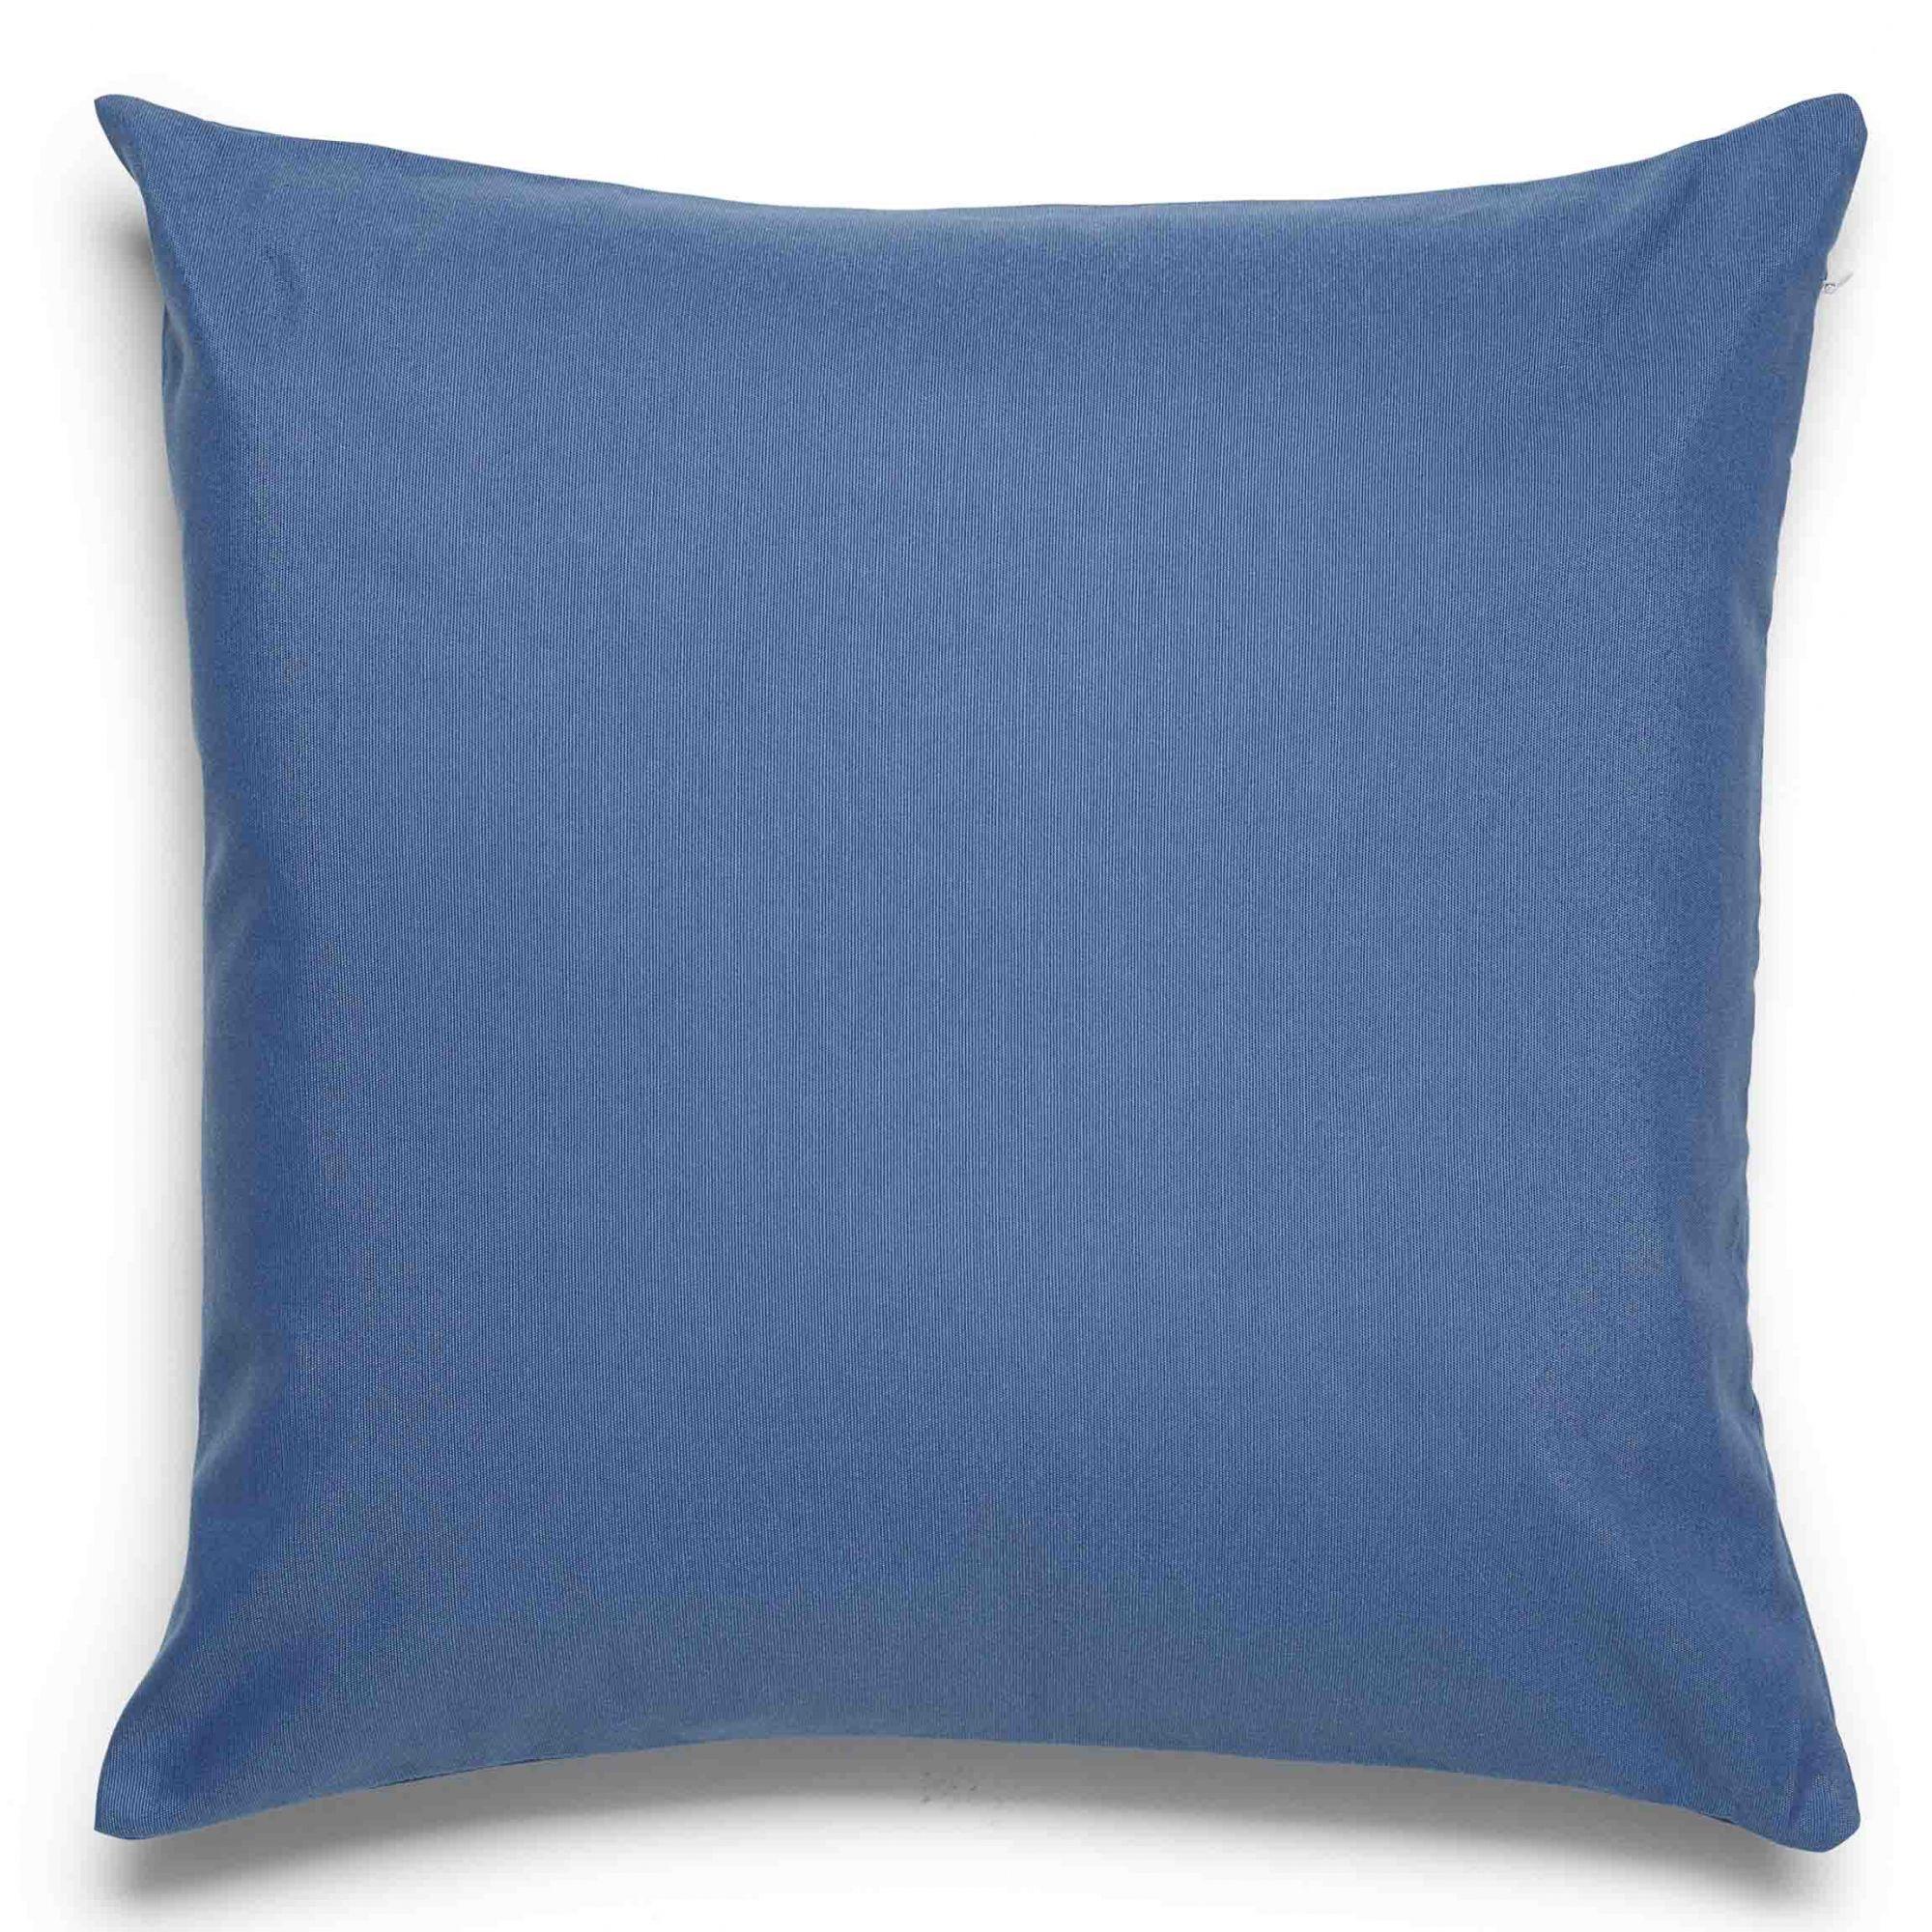 Capa para almofada santista madri 45 x 45 cm 81% algodao 19% poliester azul